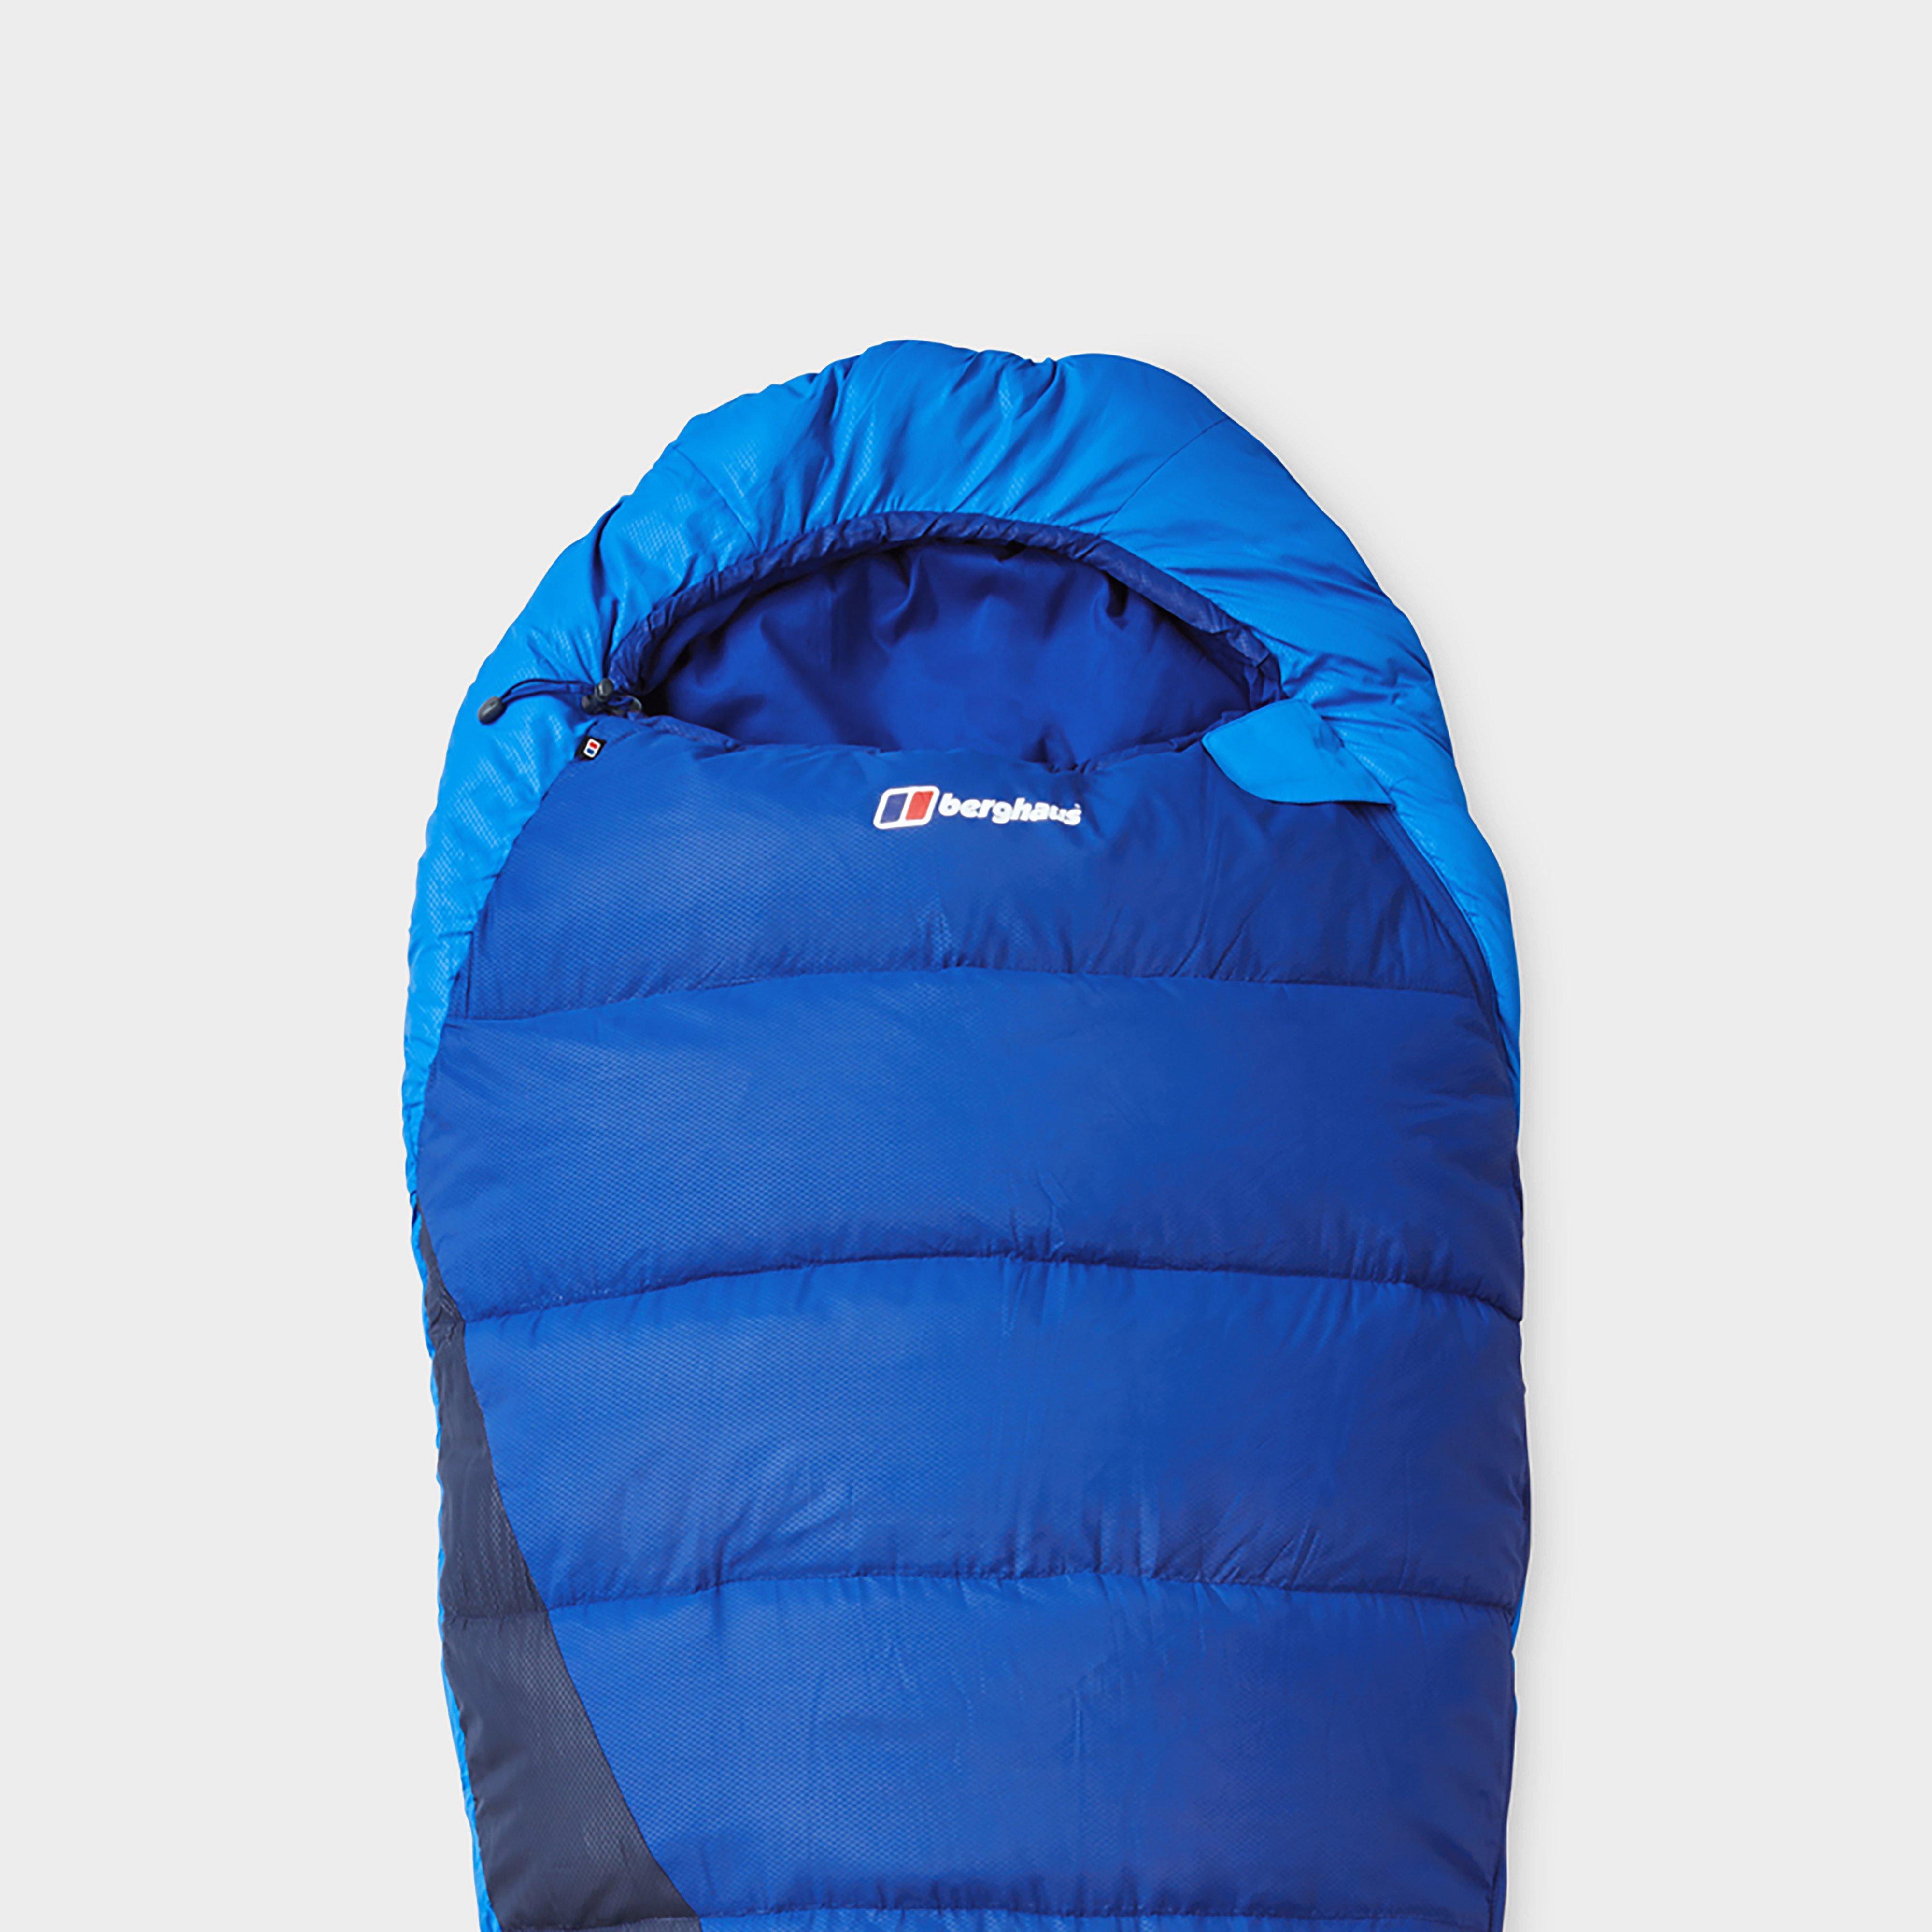 Berghaus Transition 200 Sleeping Bag - Blue  Blue